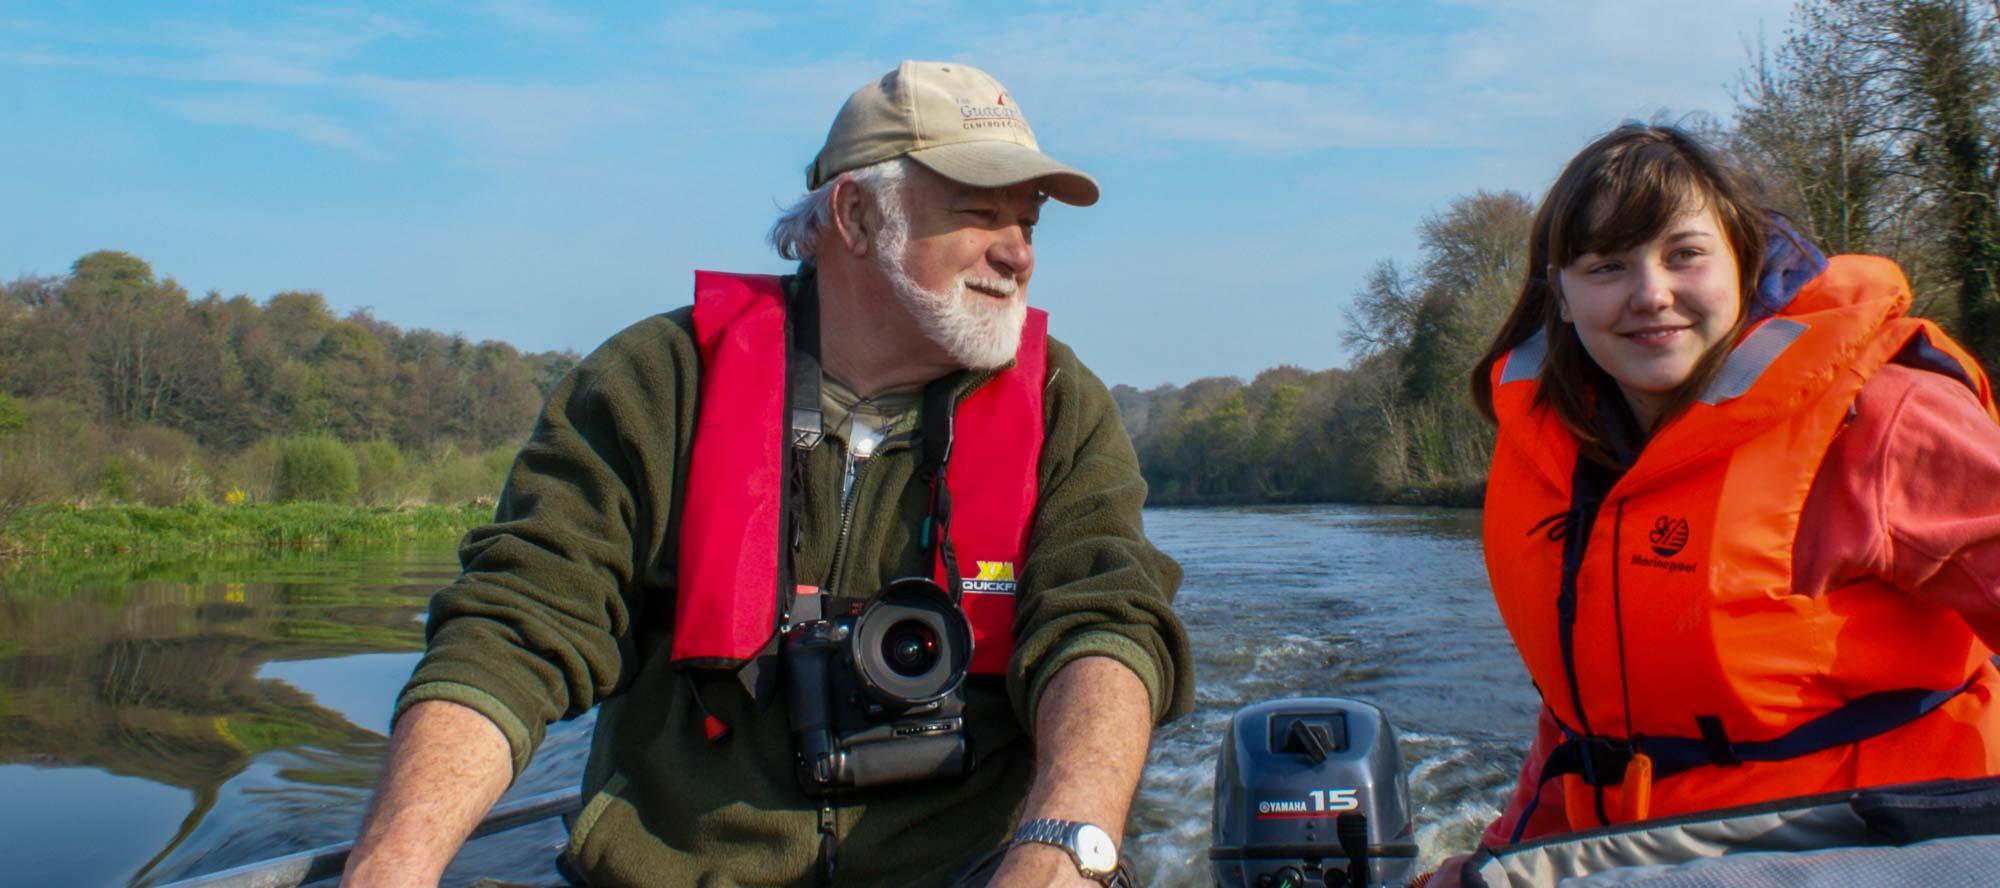 John Ironside Photographer